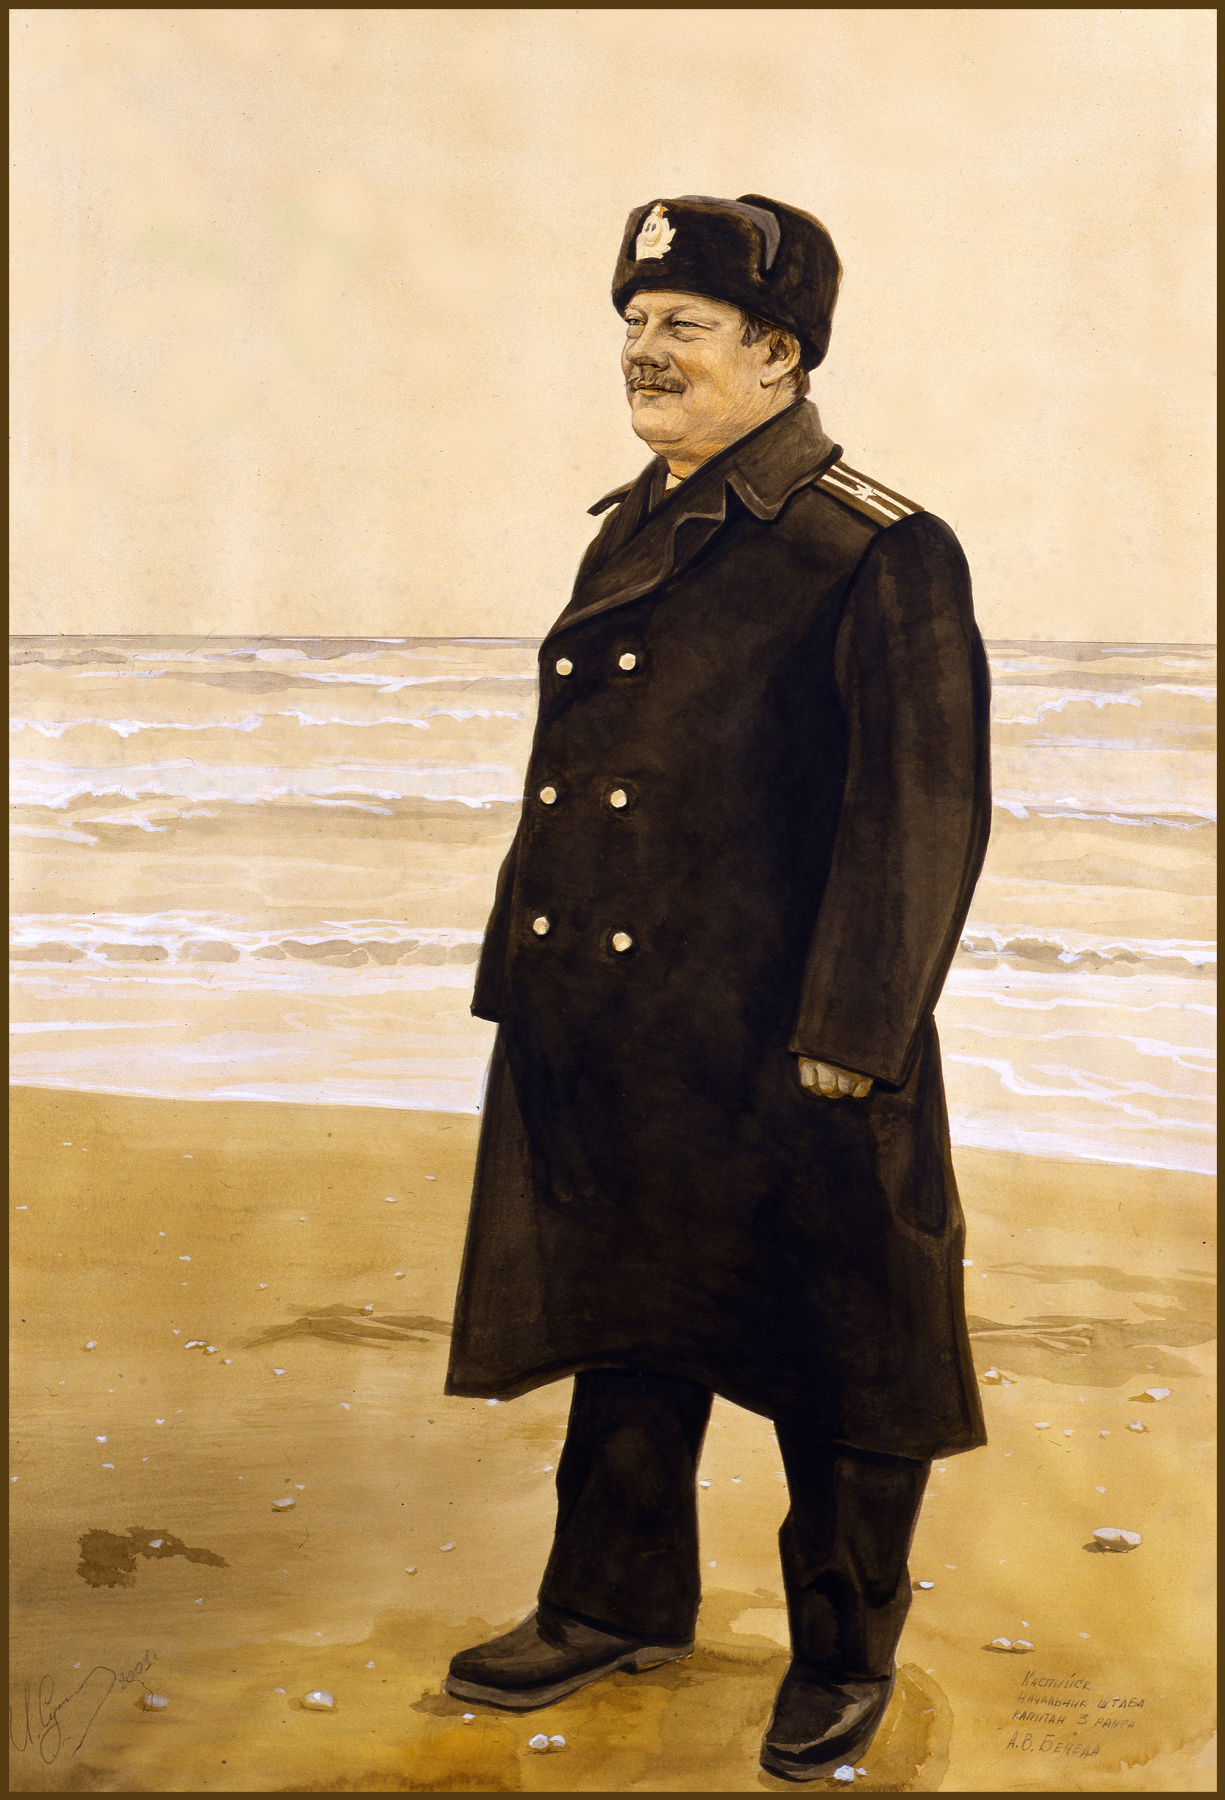 Sushienok64 @ mail.ru Mikhailovich Sushenok Igor. Captain of the third rank A.V. Beneda